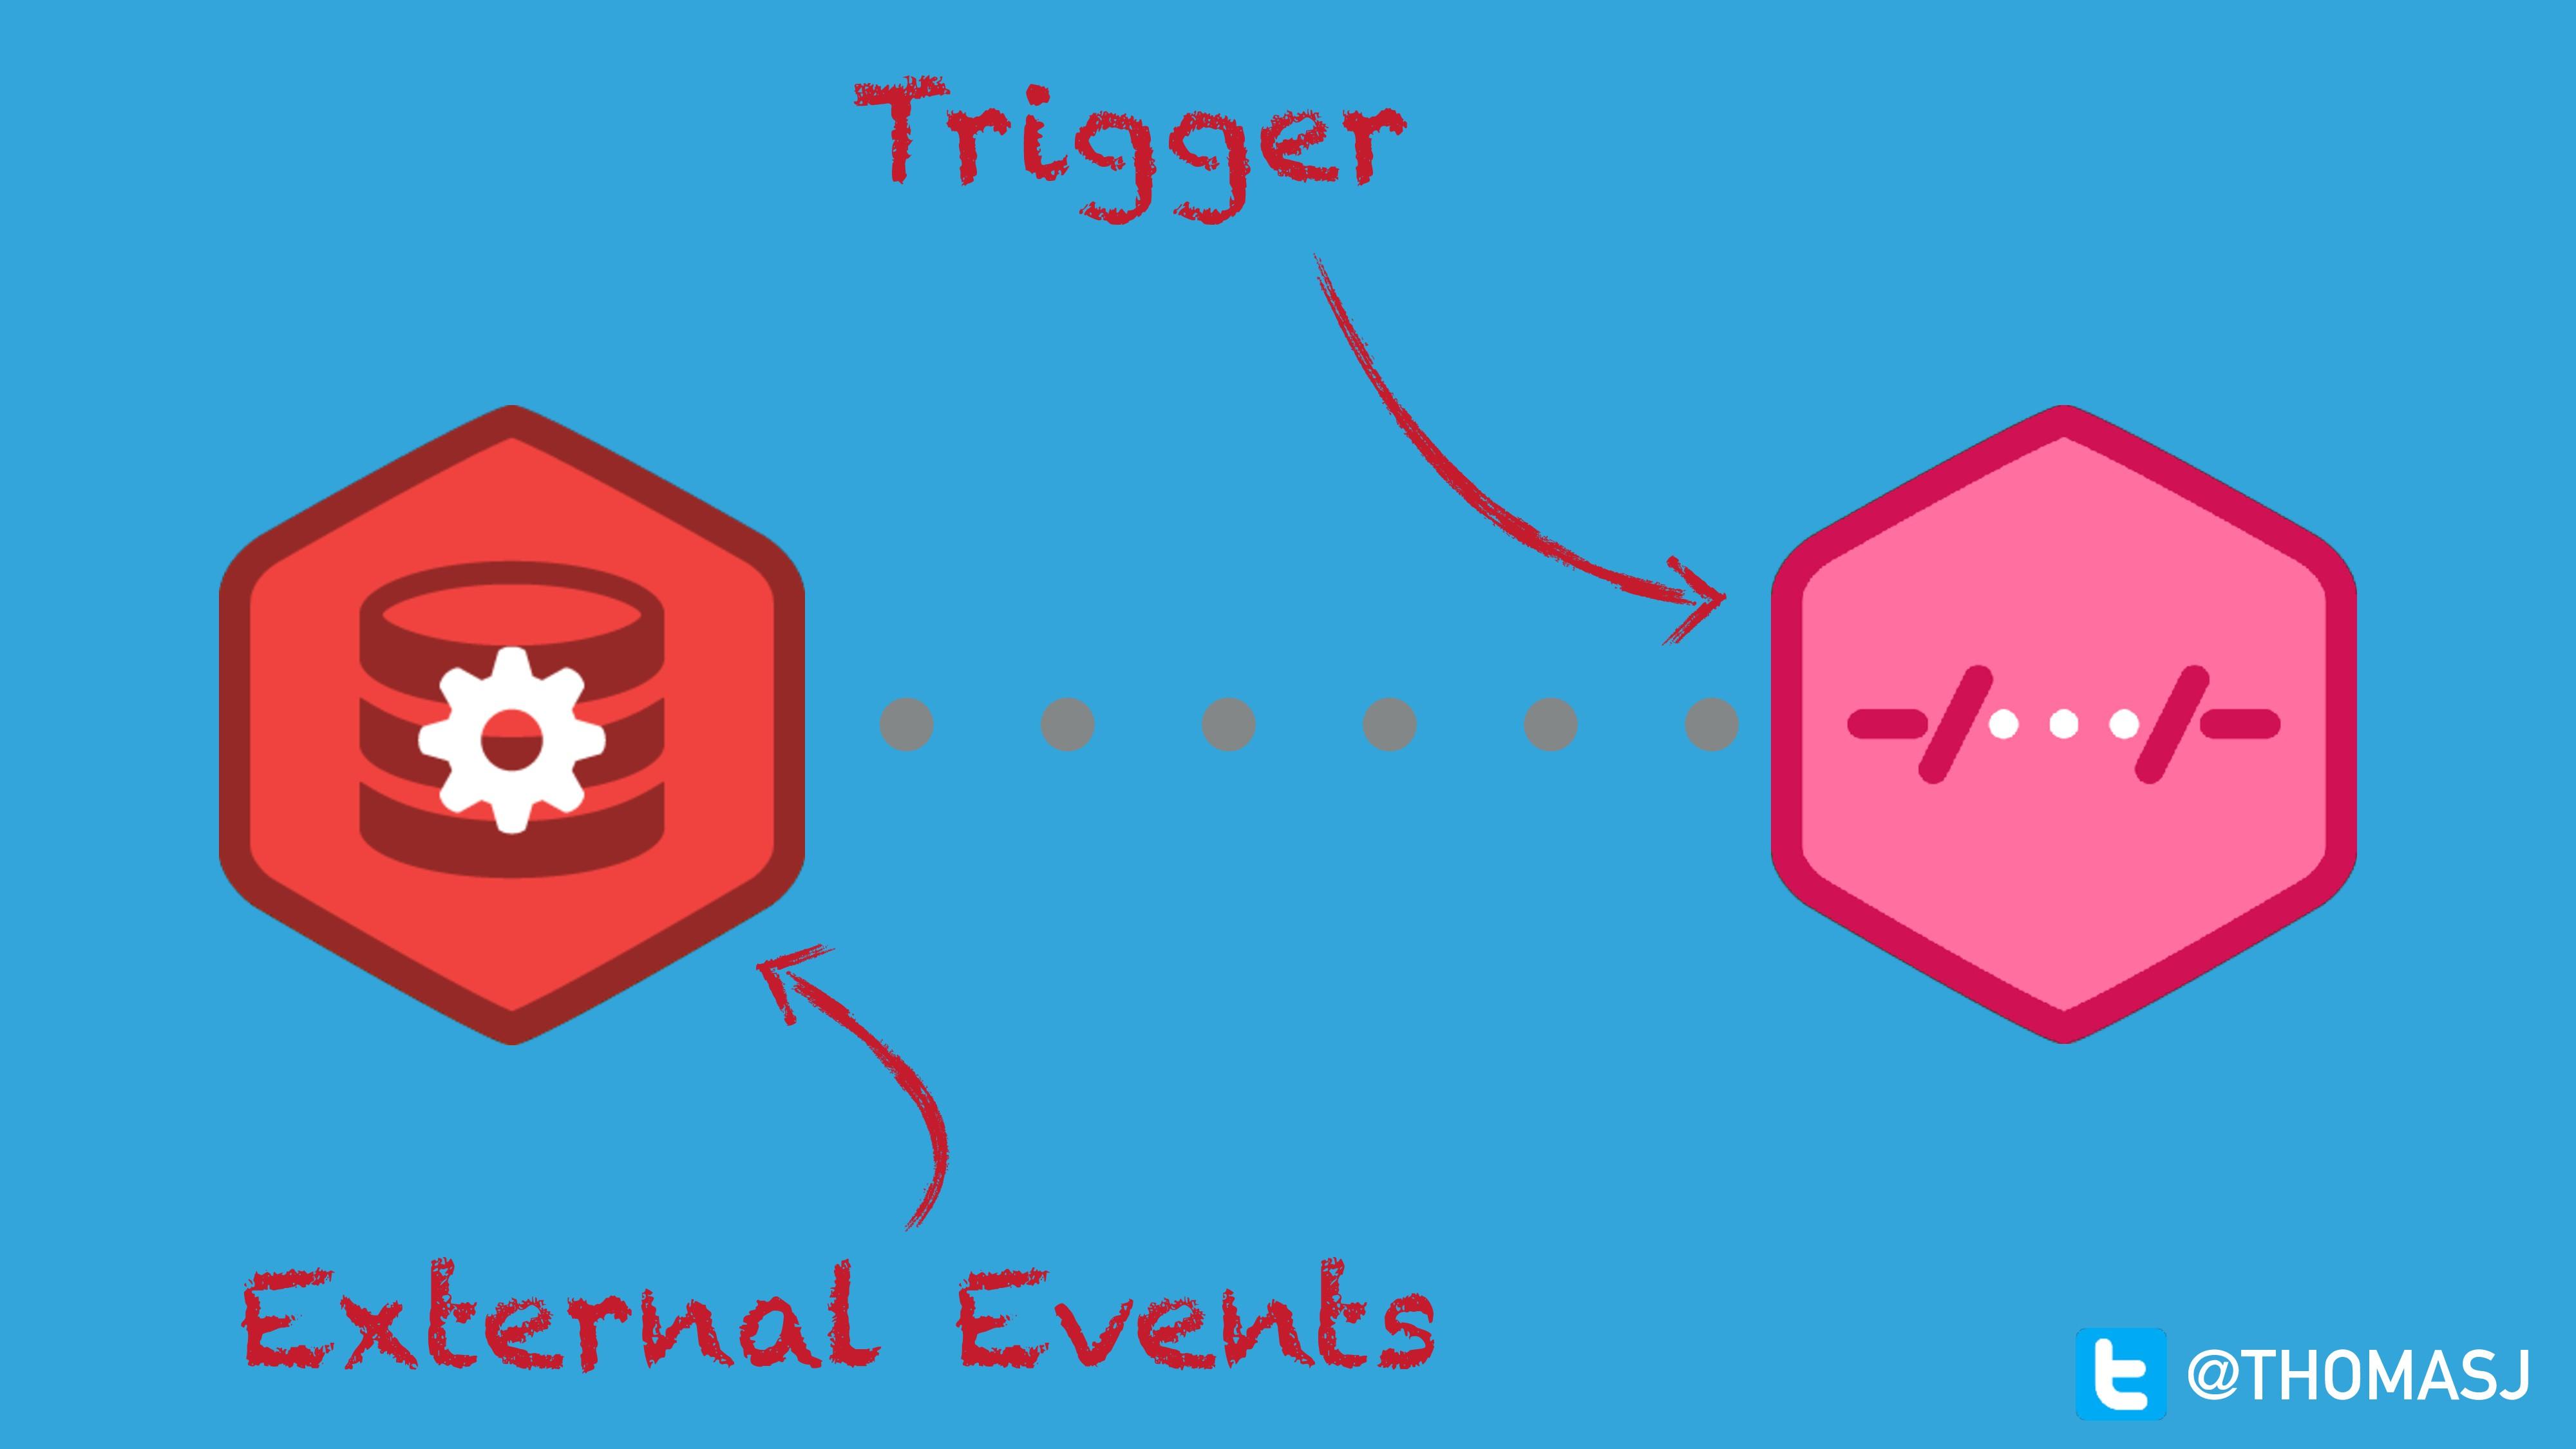 External Events Trigger @THOMASJ